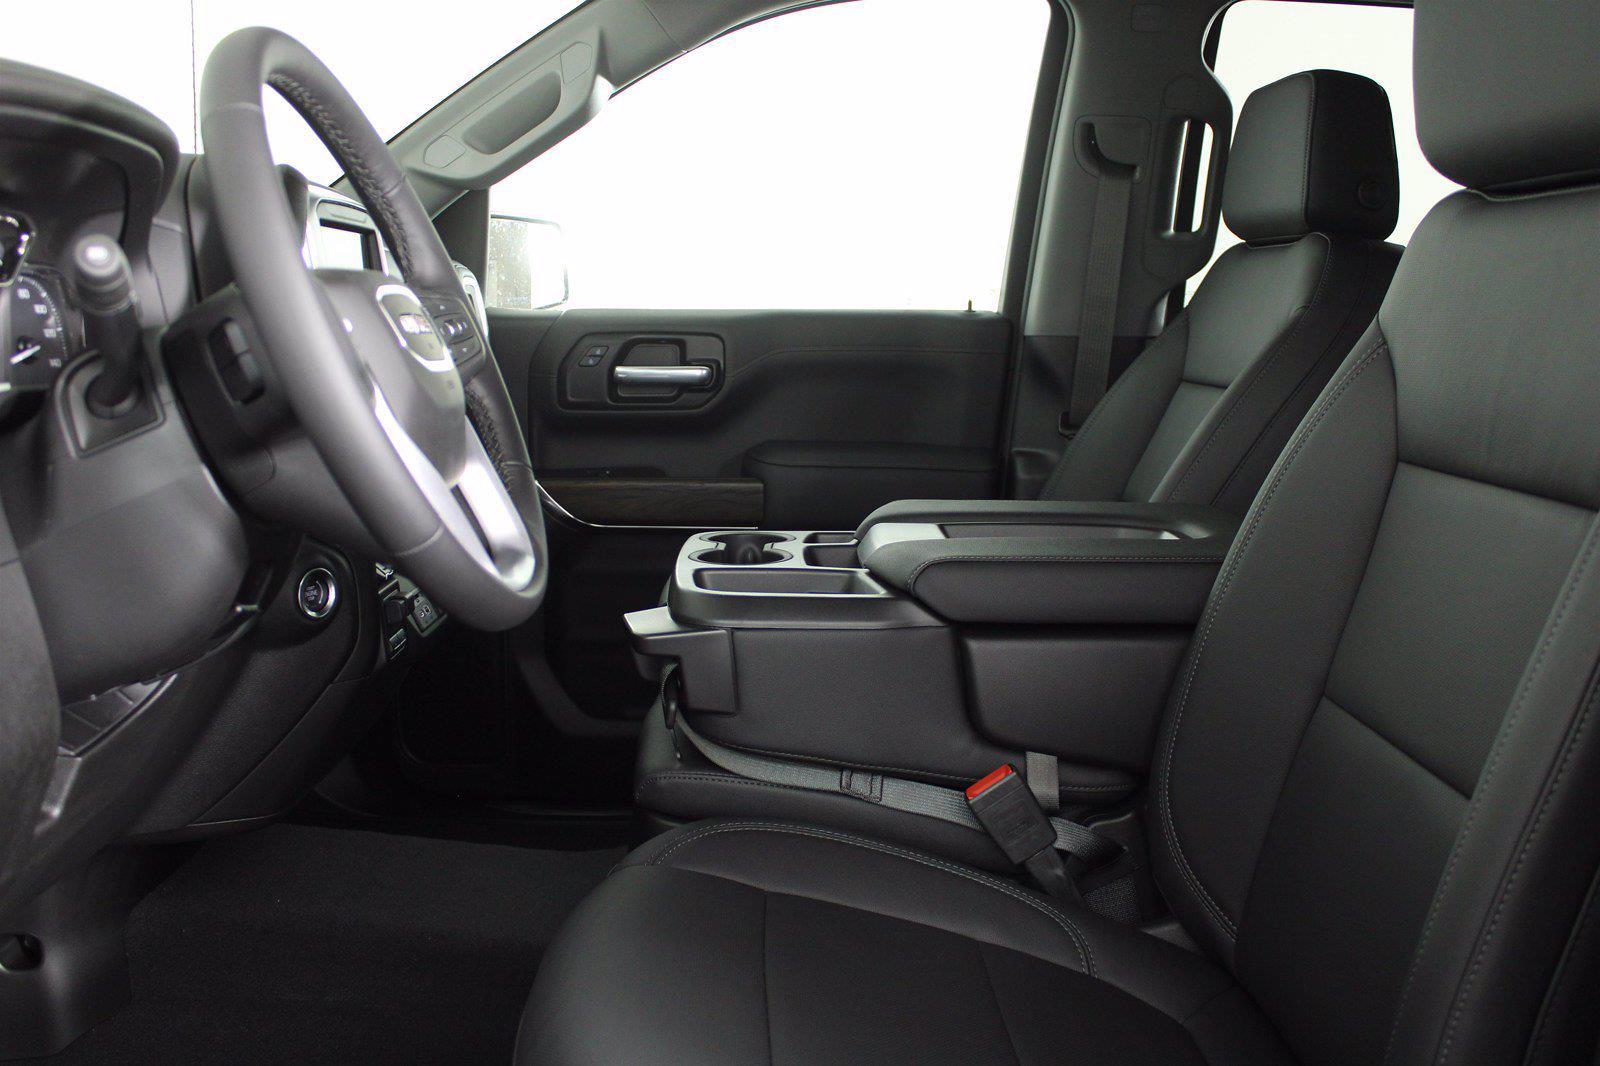 2021 GMC Sierra 1500 Crew Cab 4x4, Pickup #D410588 - photo 14